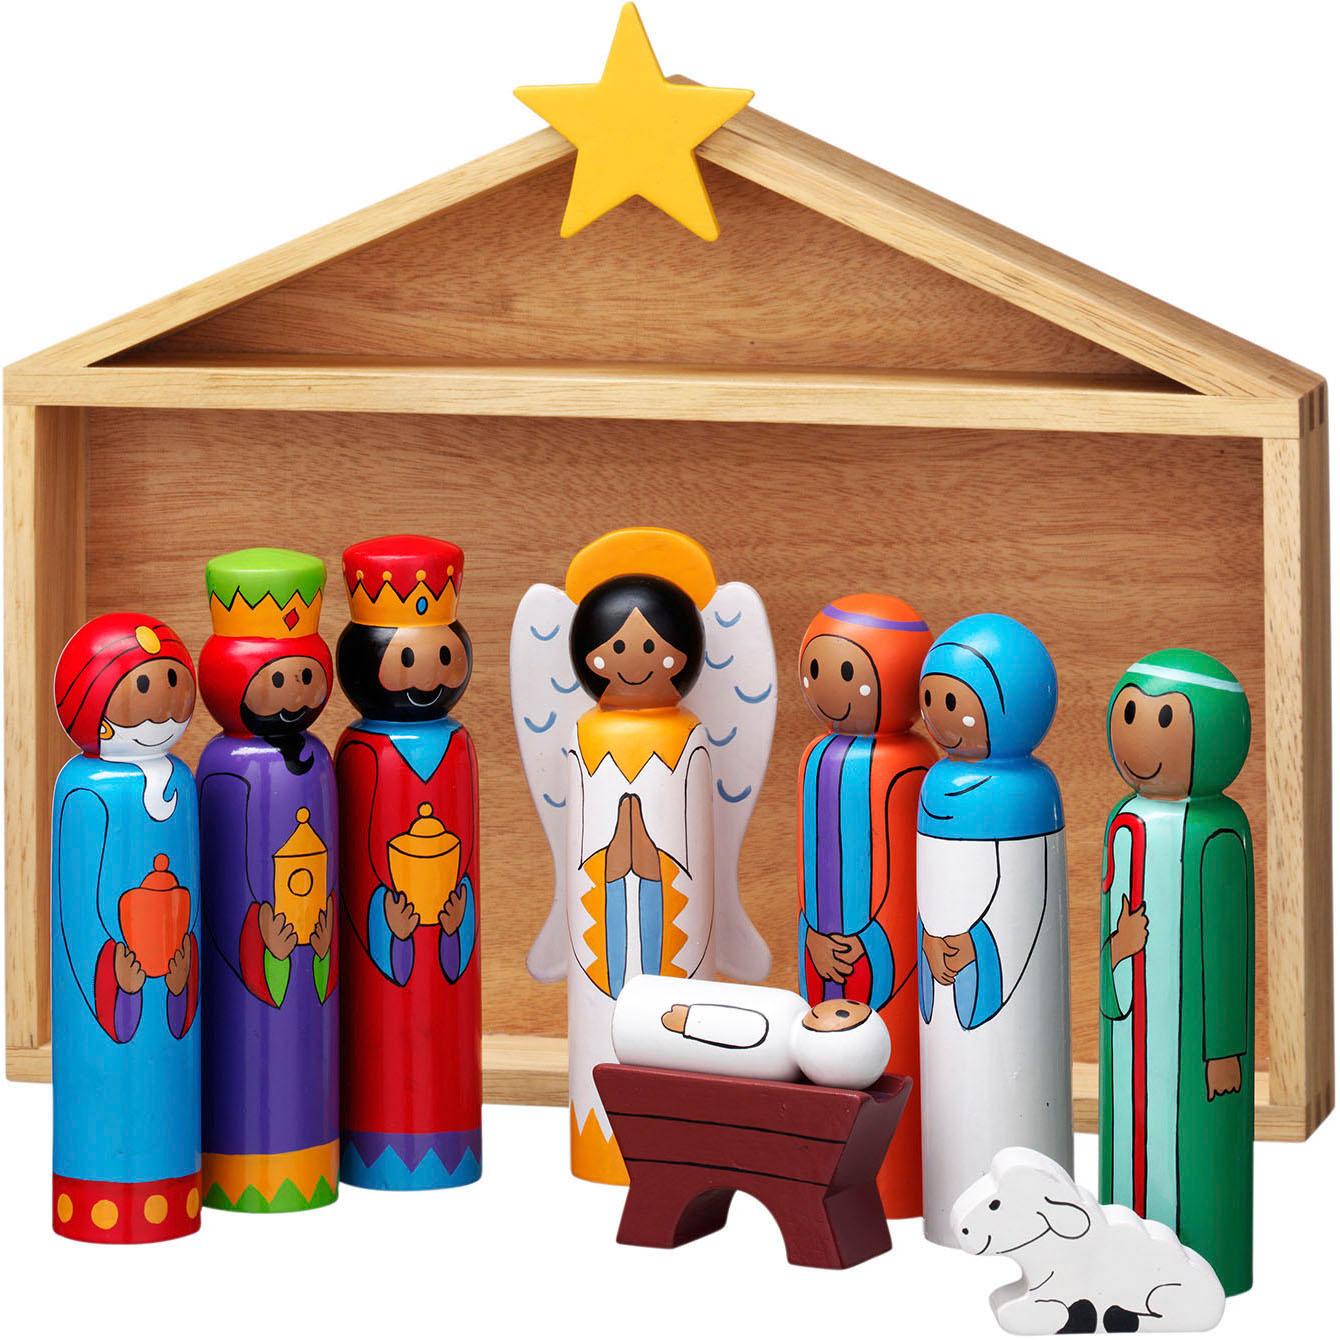 BU97-lanka-kade-nativity-stable-9-characters